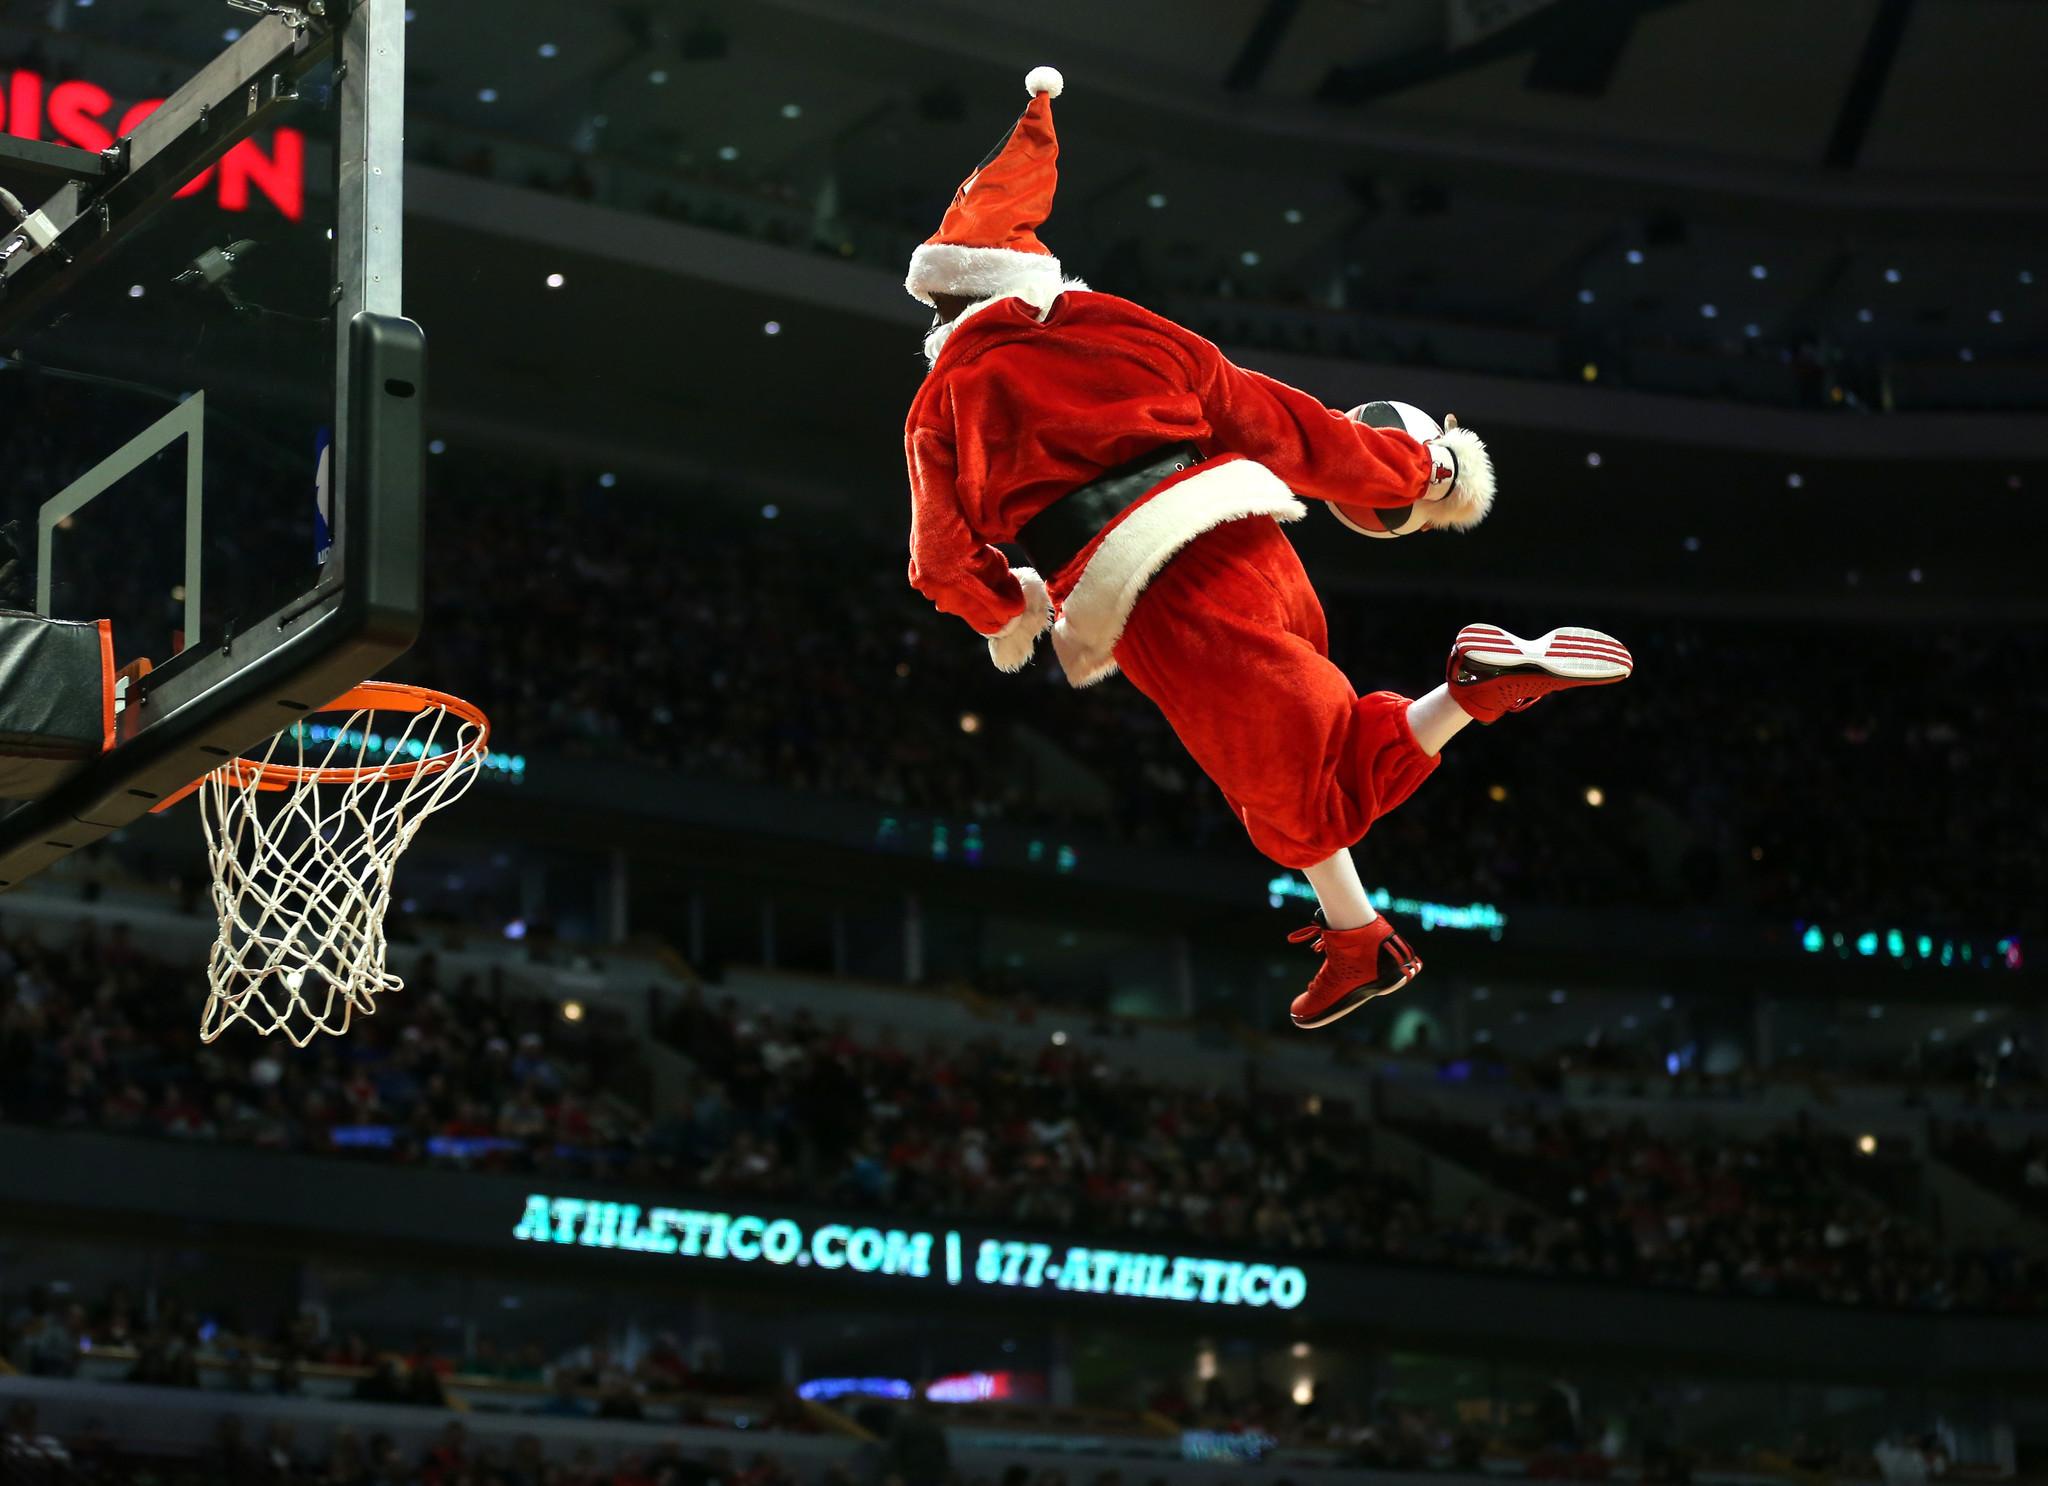 bulls u0026 39  streak of seven straight christmas games will end in 2017